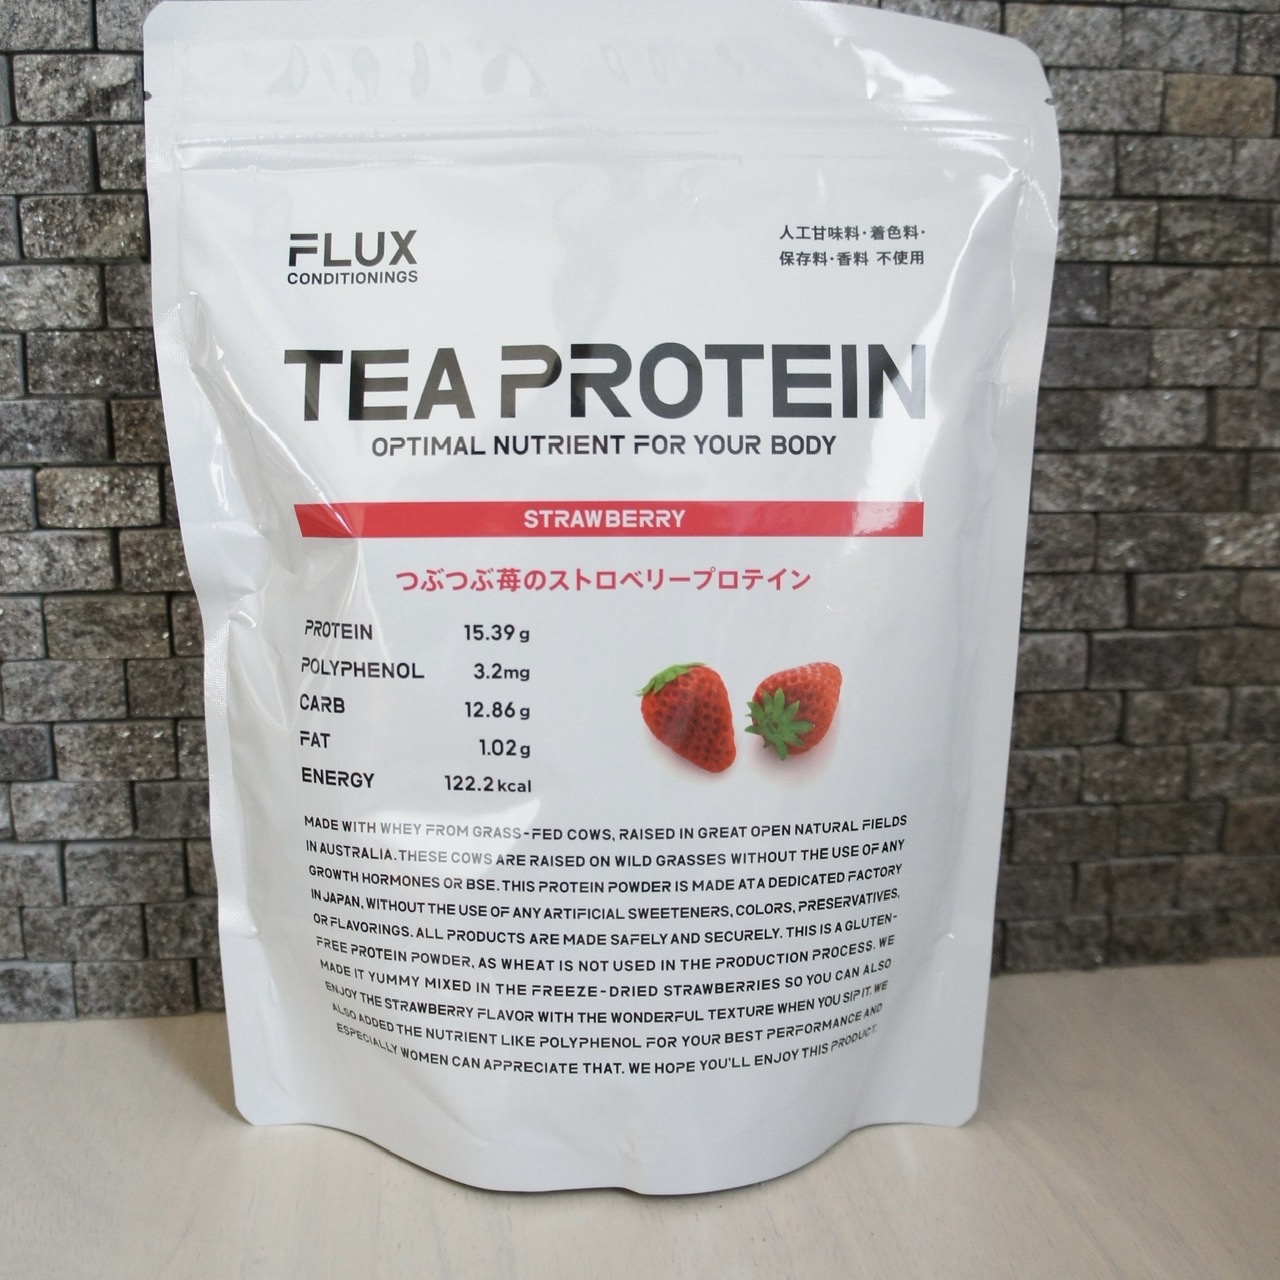 TEA PROTEIN